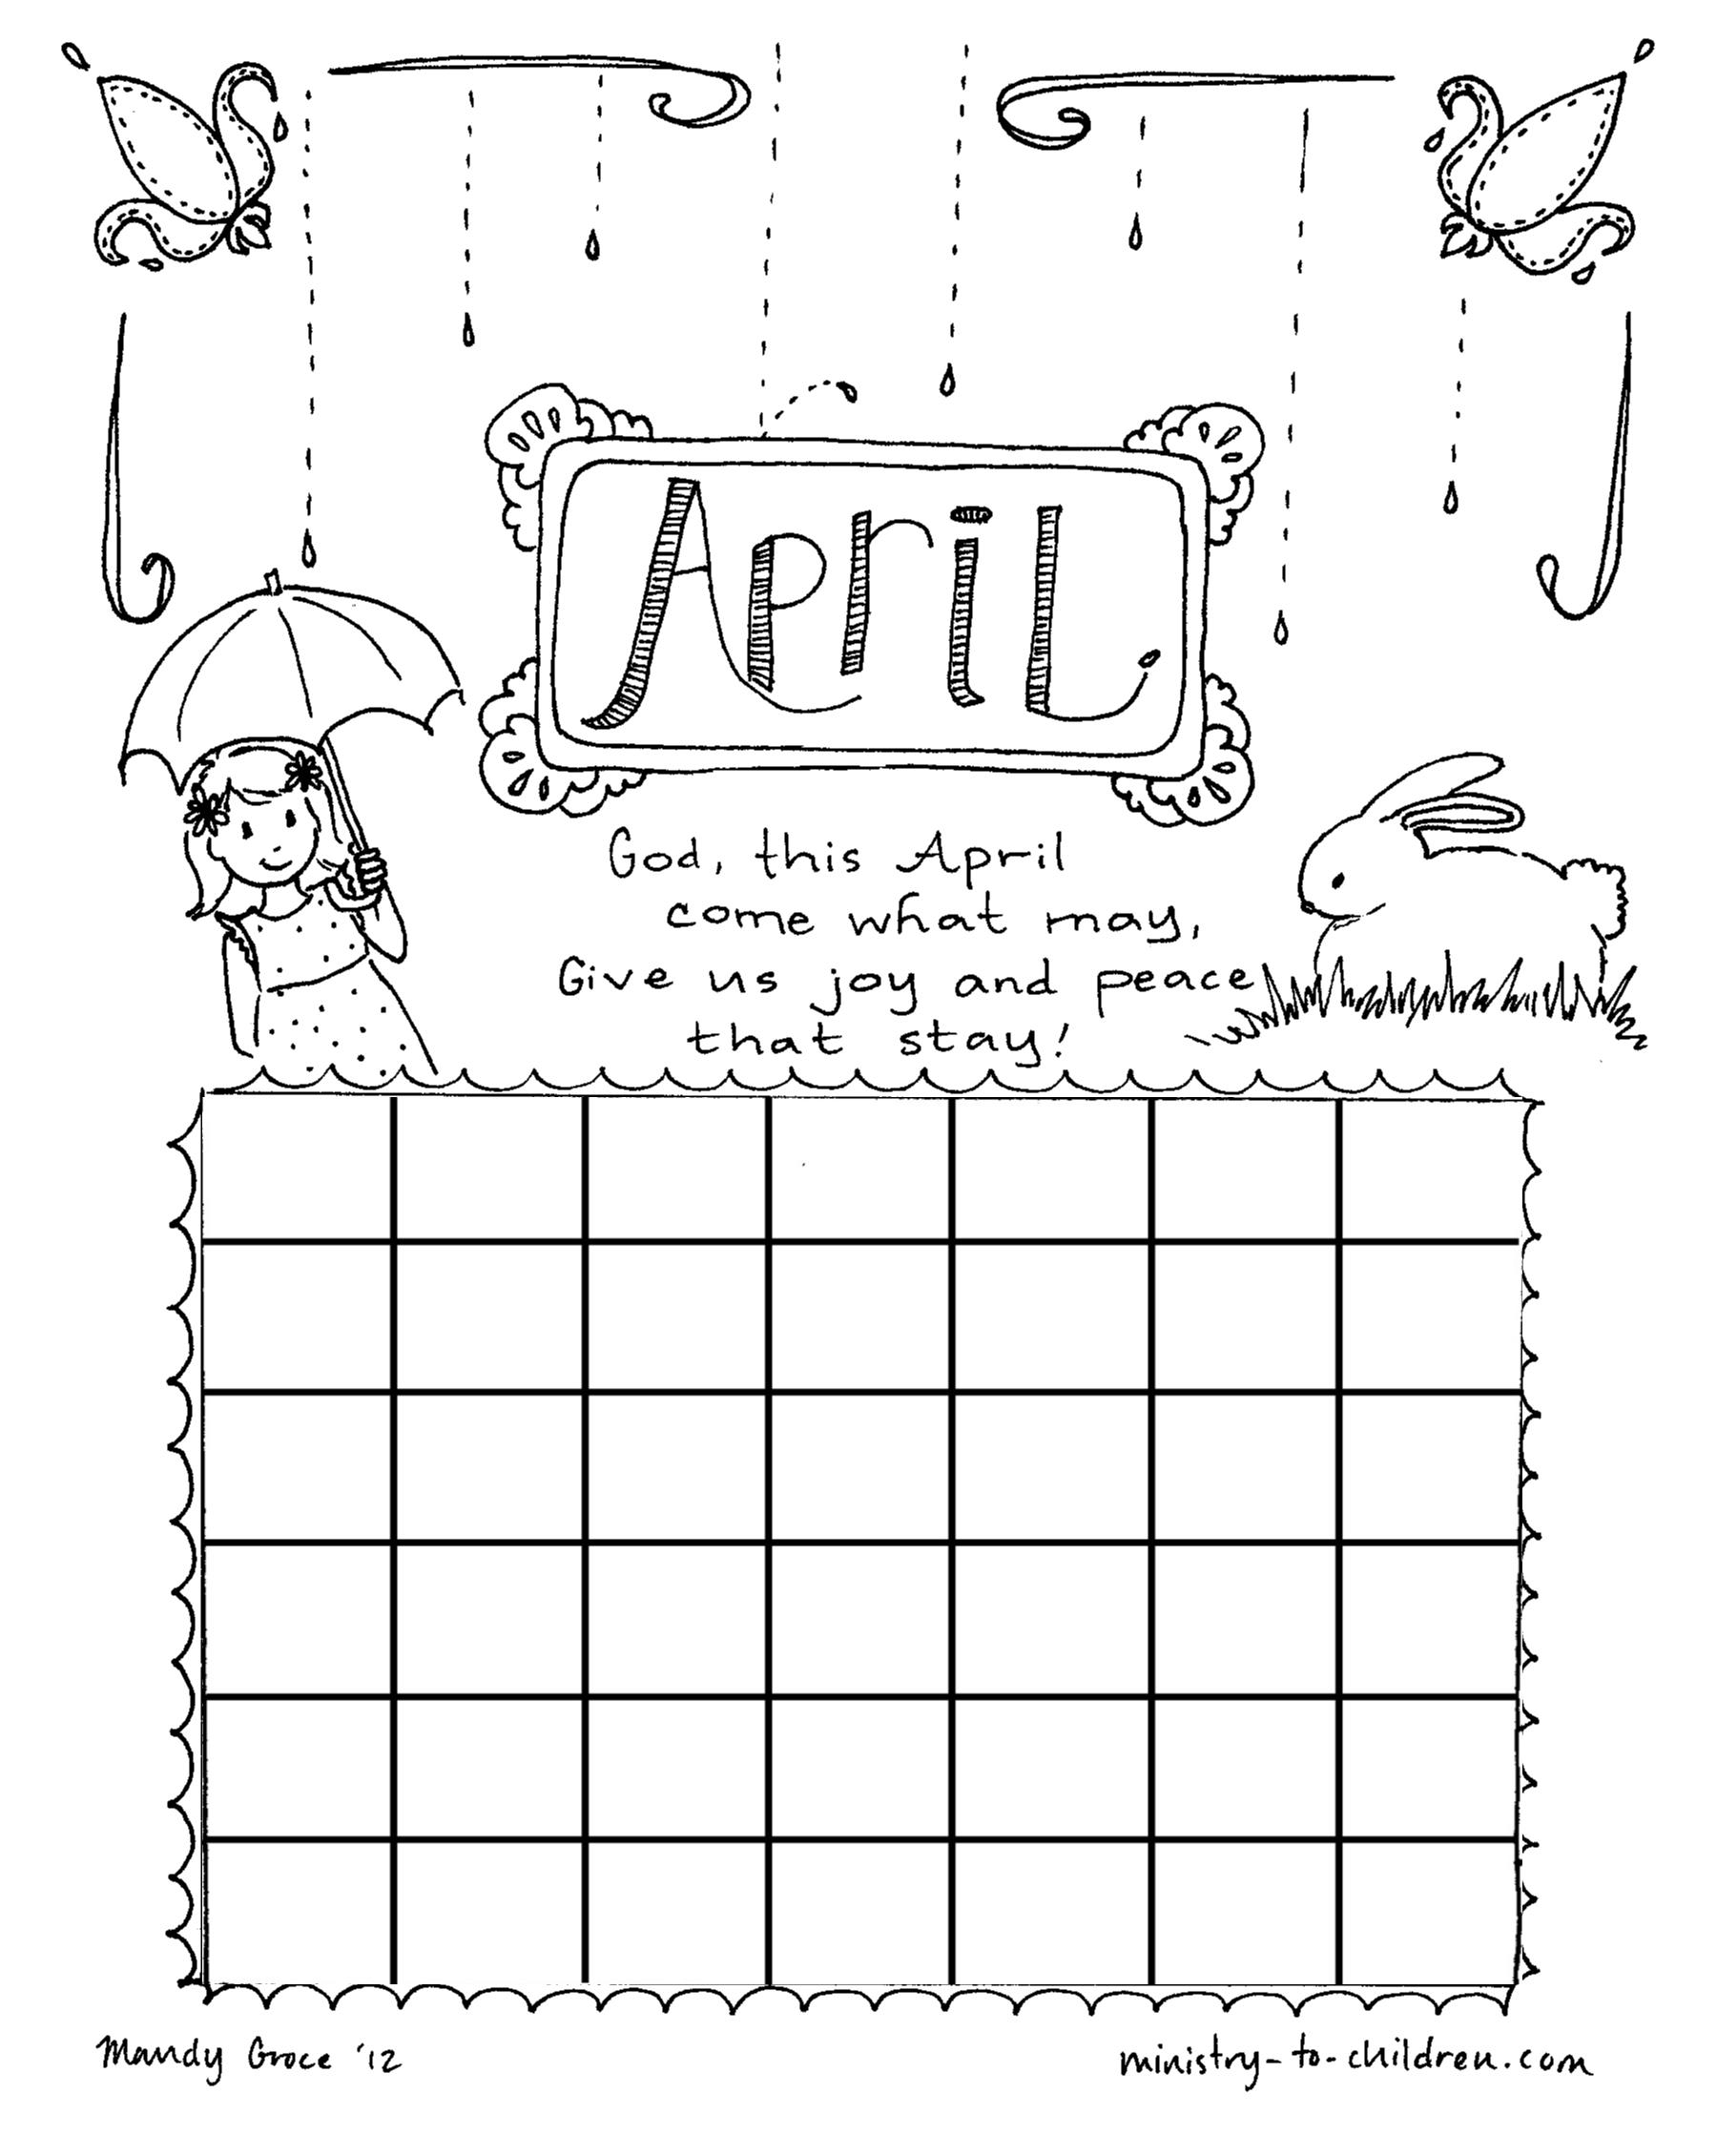 April Coloring Page Calendar Sheet For Kids Kids